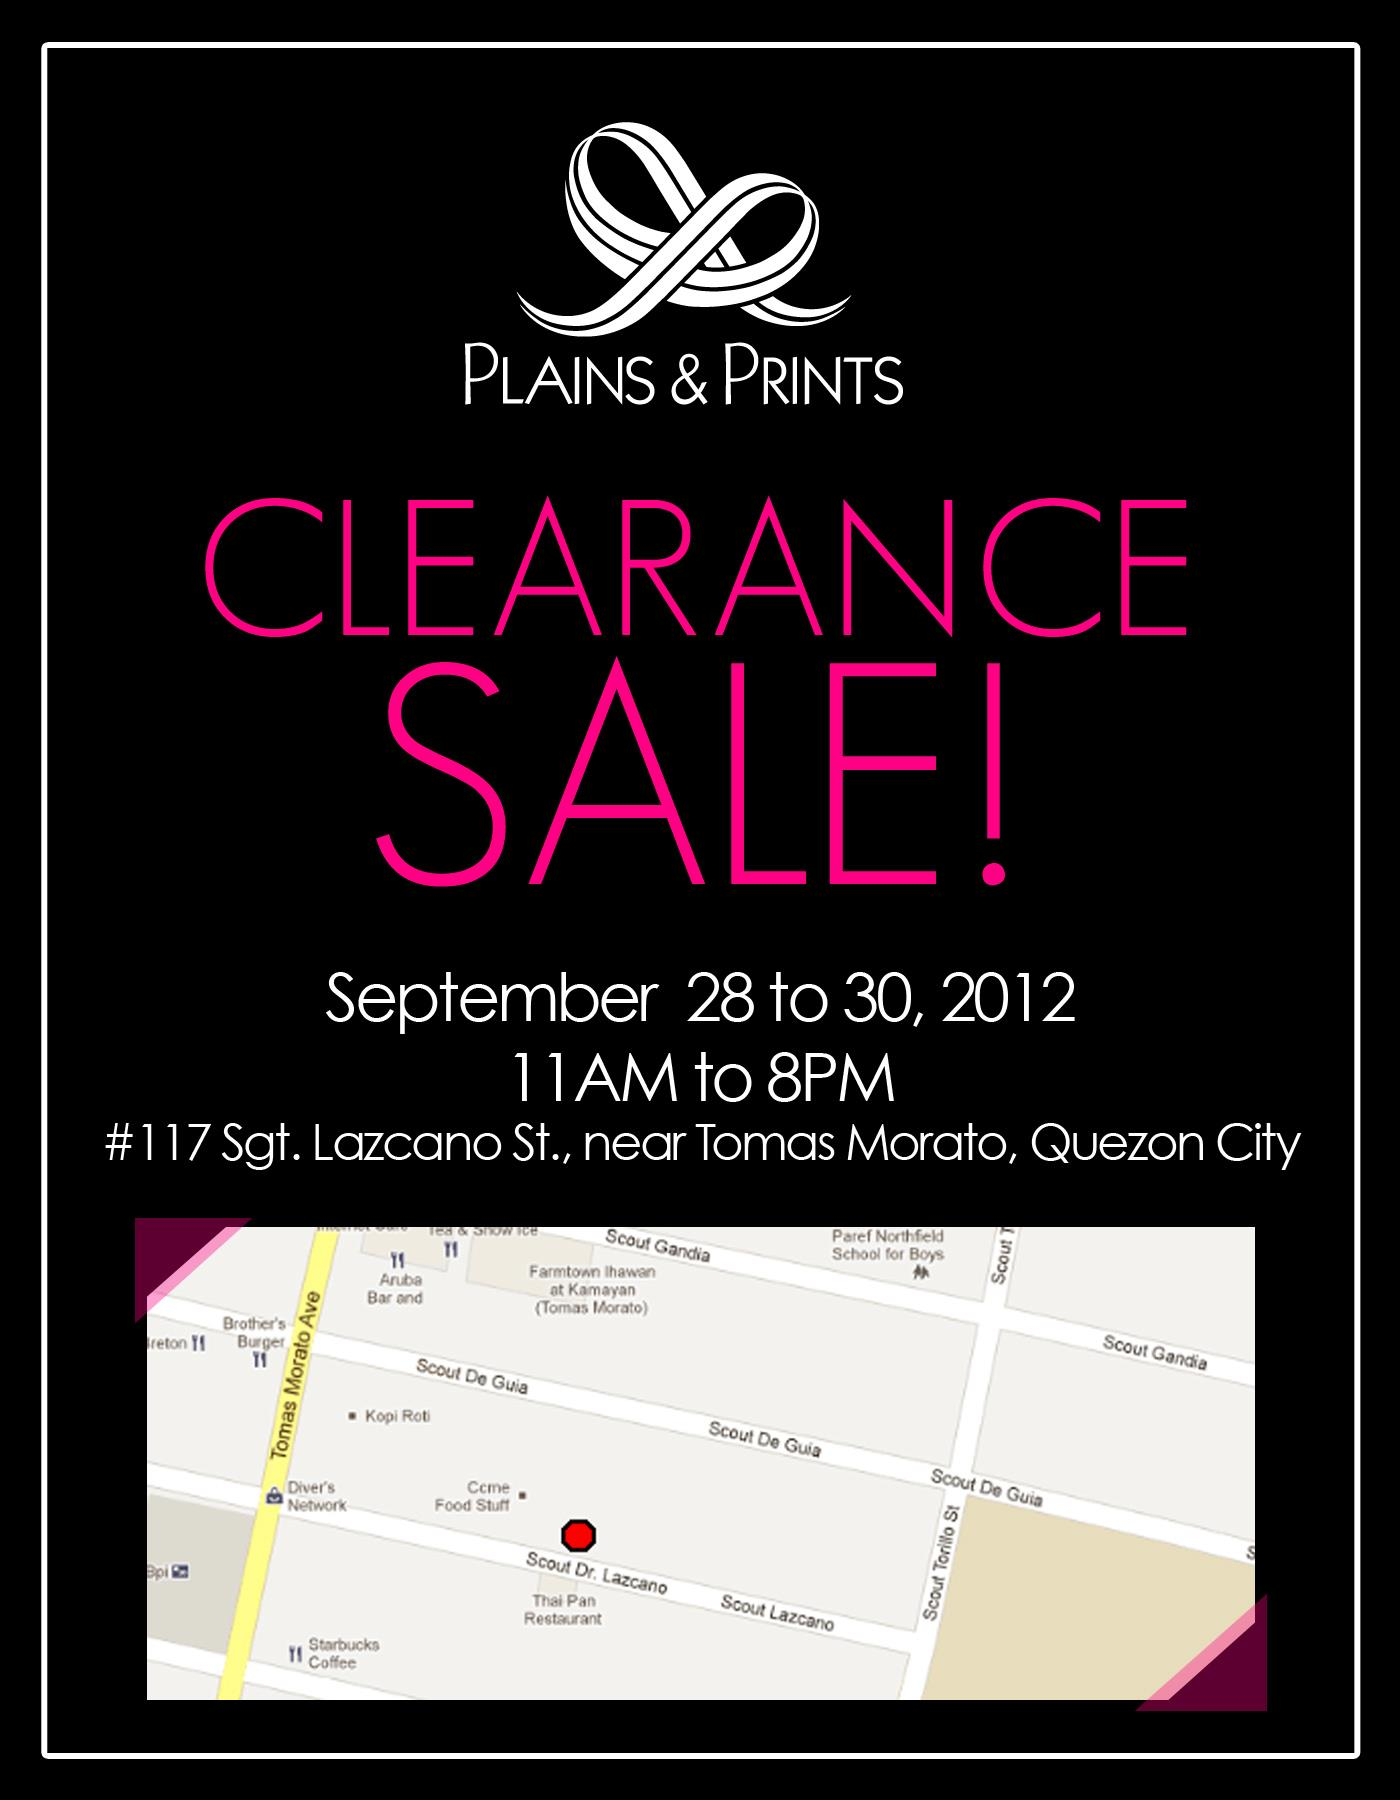 Plains & Prints Clearance Sale September 2012